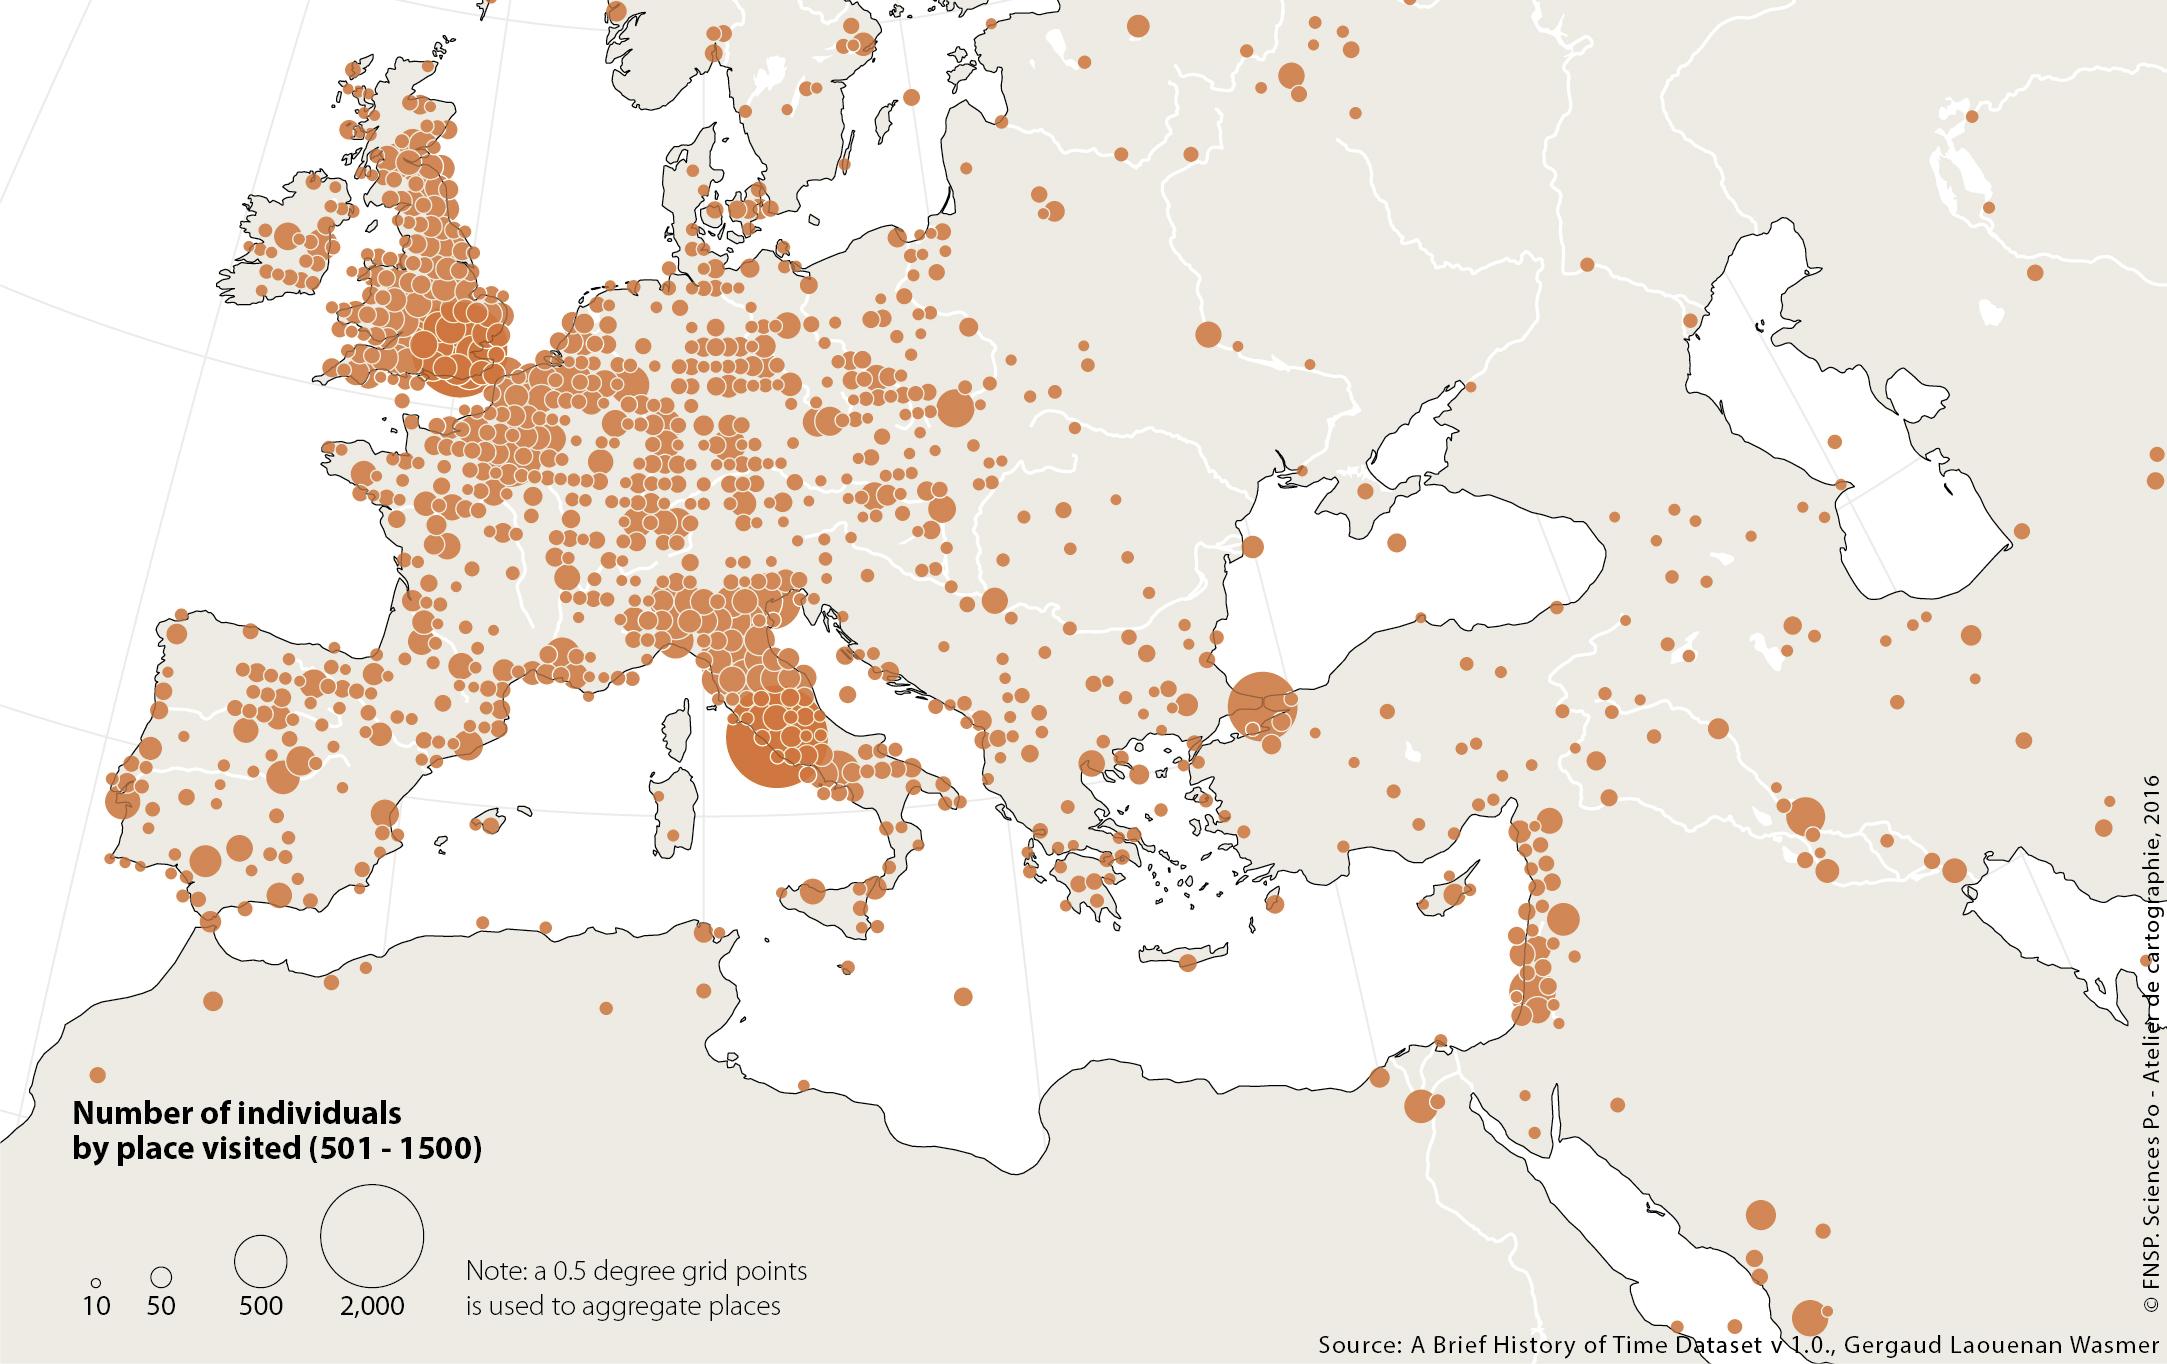 Europe (501-1500)